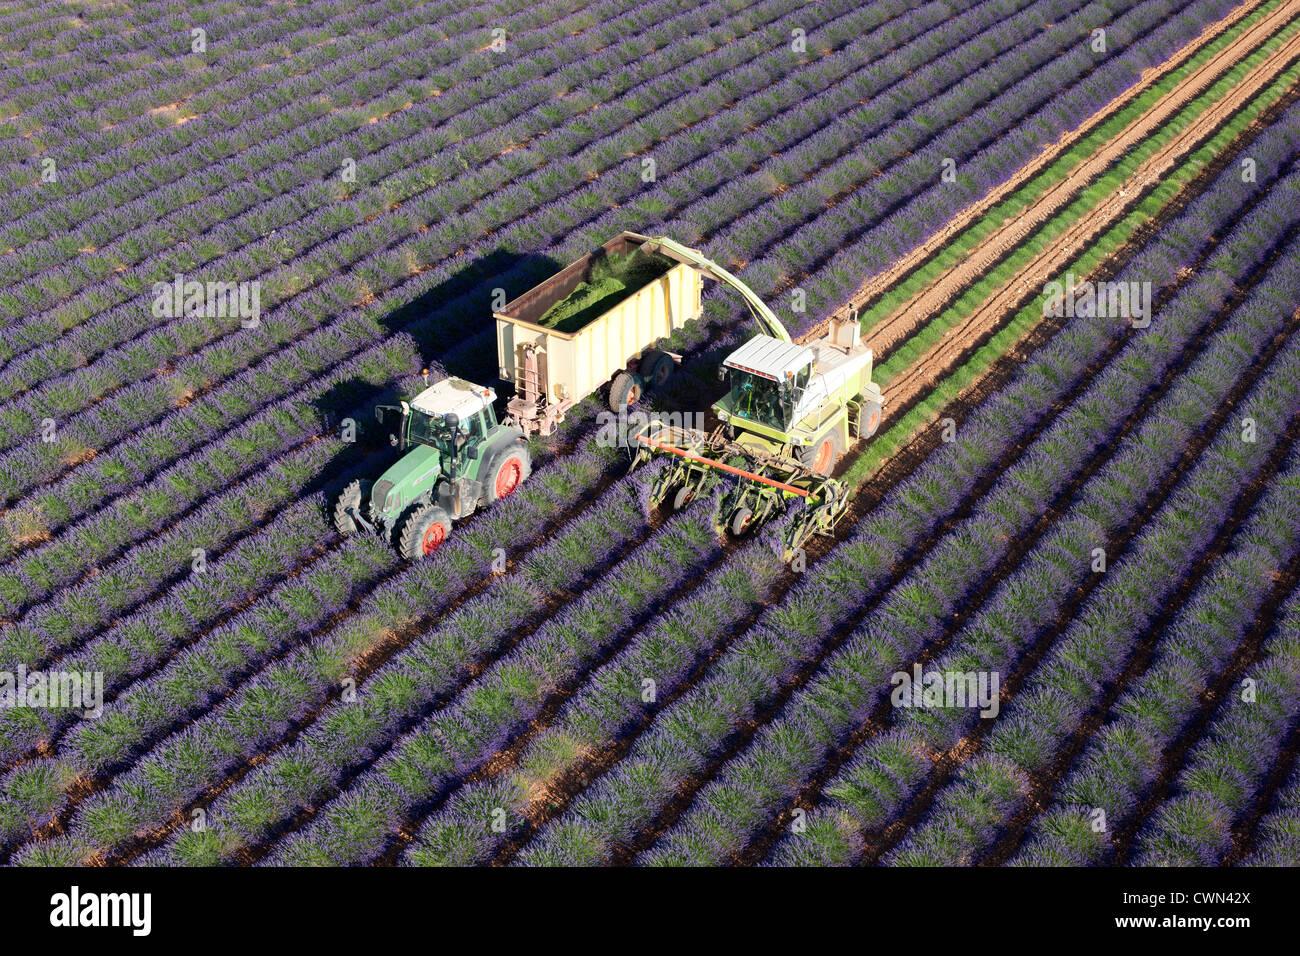 LAVENDER HARVEST (aerial view). Puimoisson, Valensole Plateau, Provence, France. Stock Photo